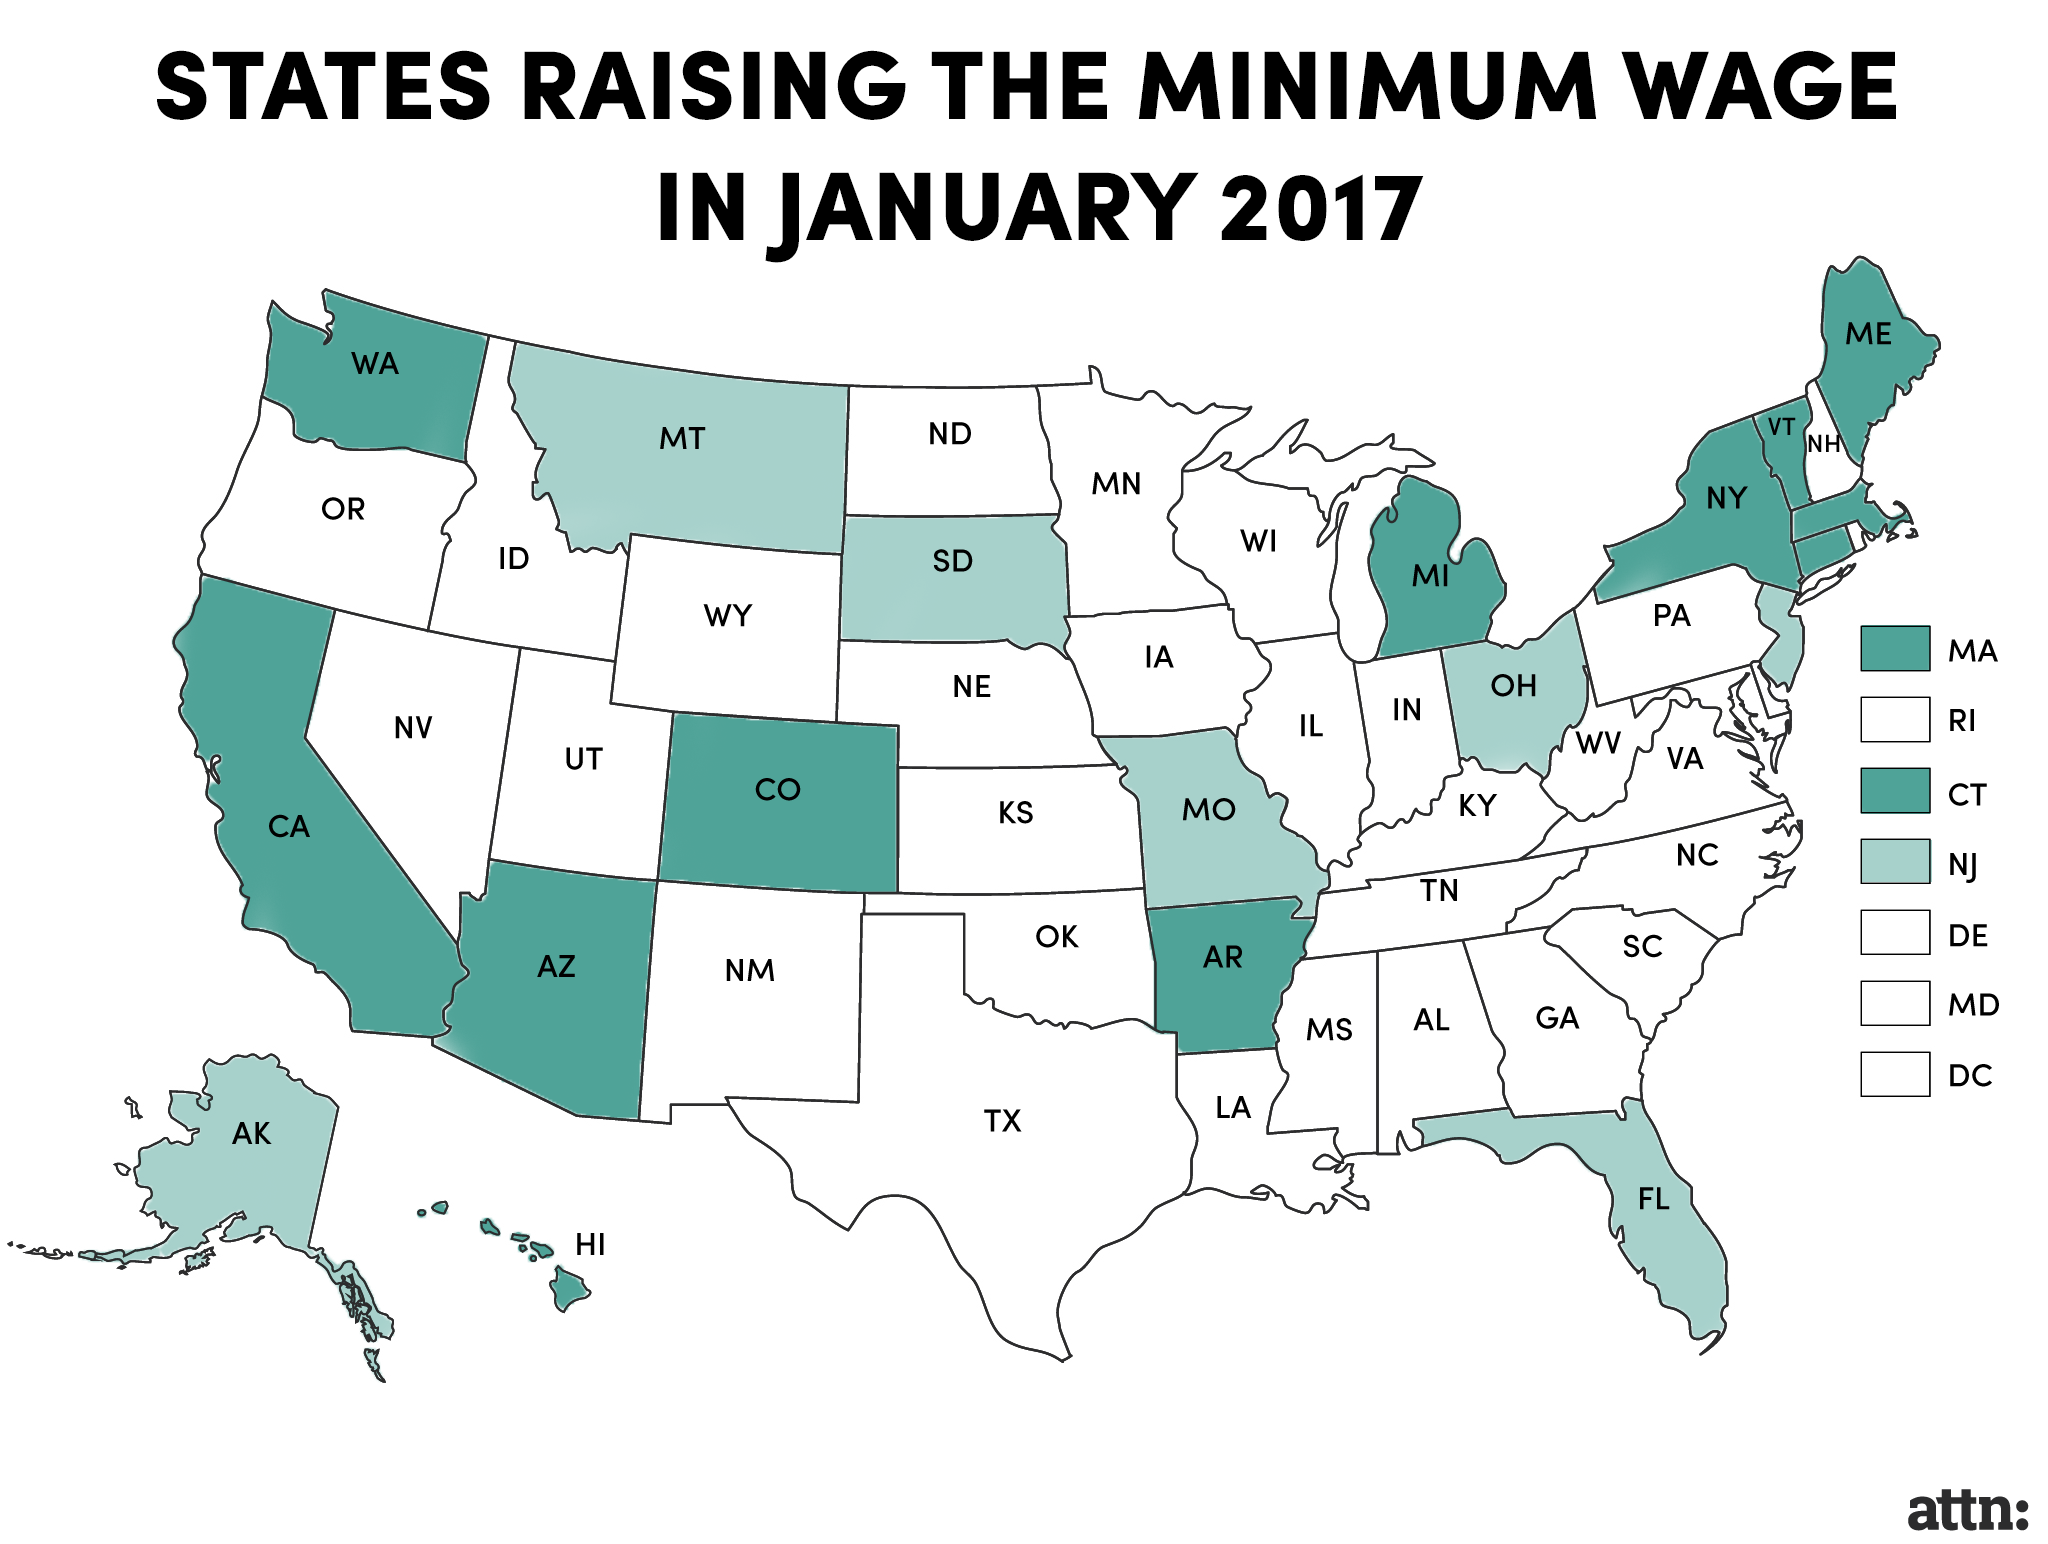 States Raising Min Wage In Jan 2017 Map Caleb Chin The Highest Minimum